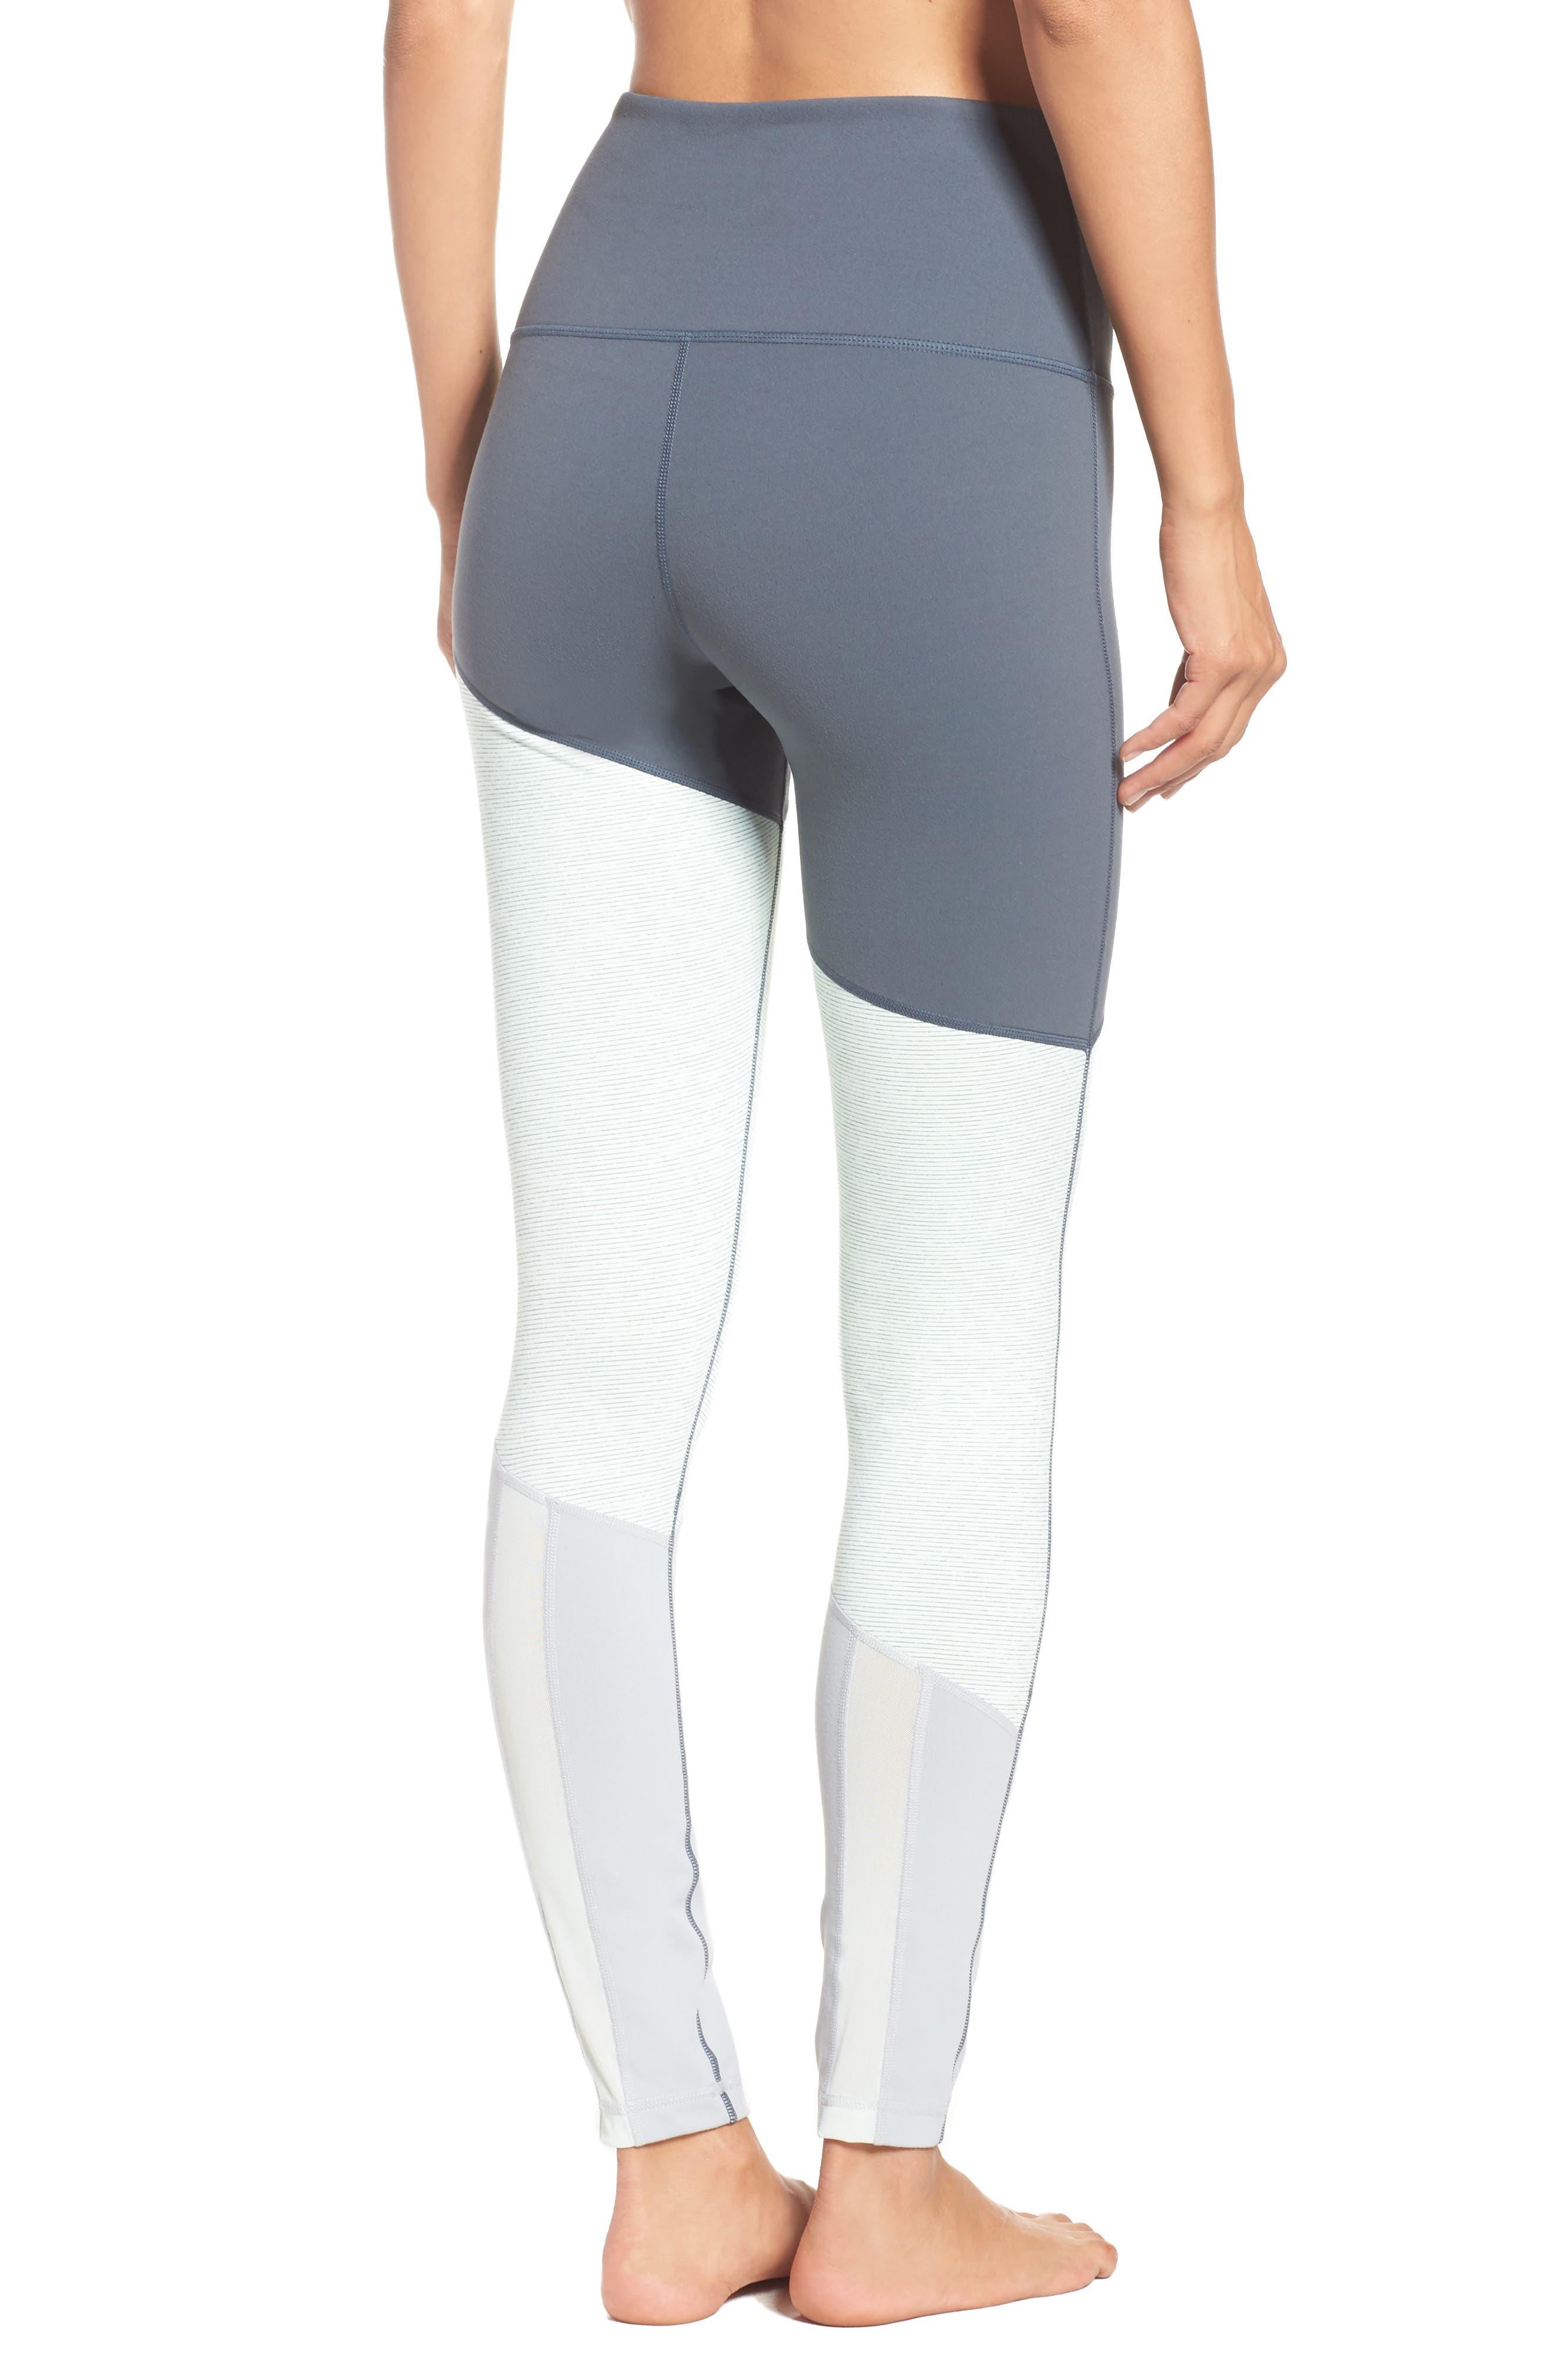 Yolo High Waist Leggings,                         Main,                         color, Grey Graphite Stellar